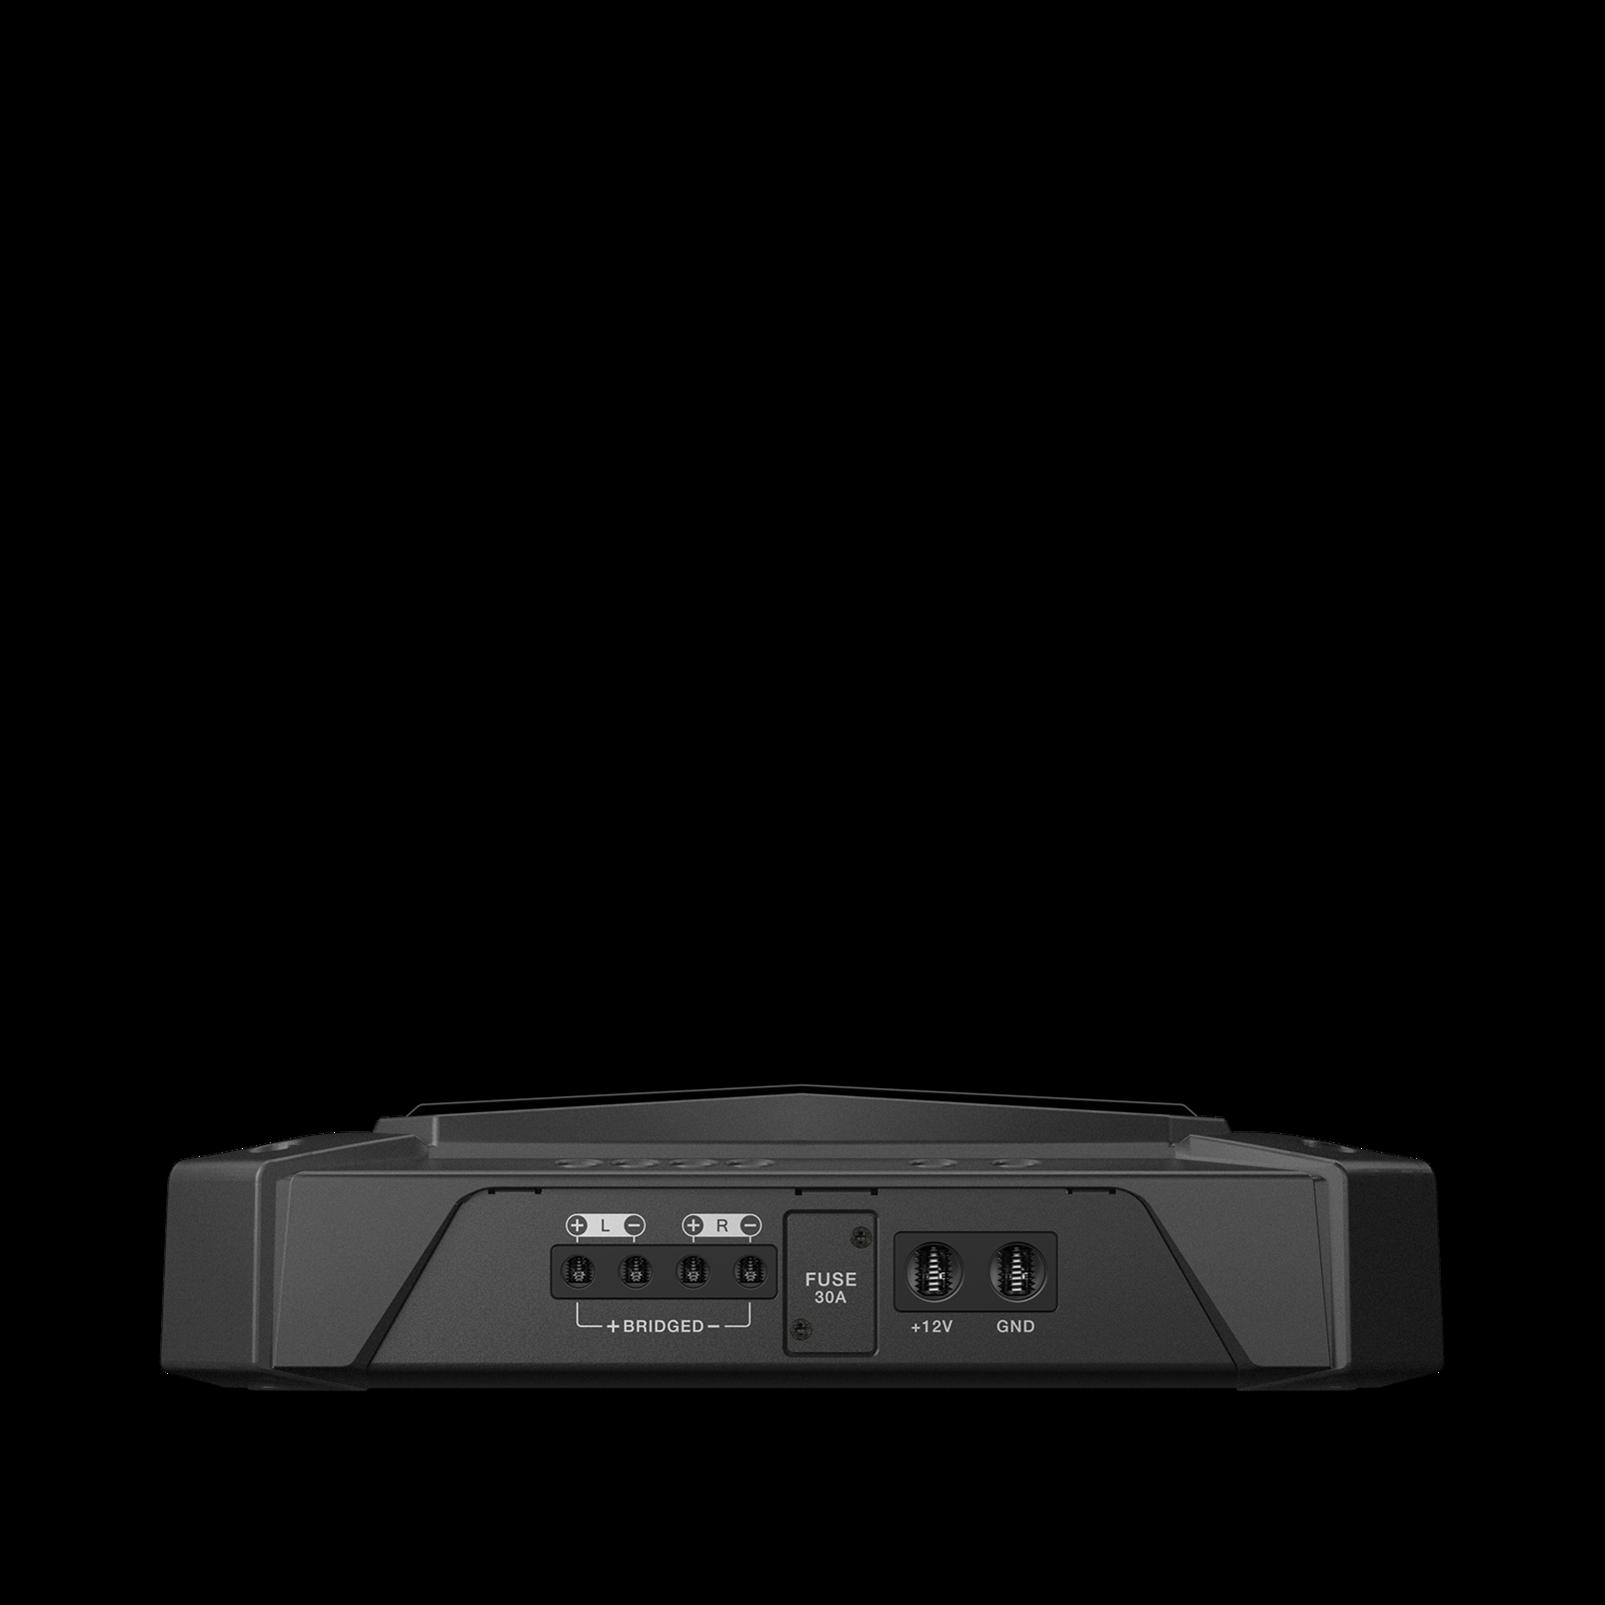 GTR-102 - Black - 2 Channel, 700W High Performance Car Amplifier - Detailshot 1